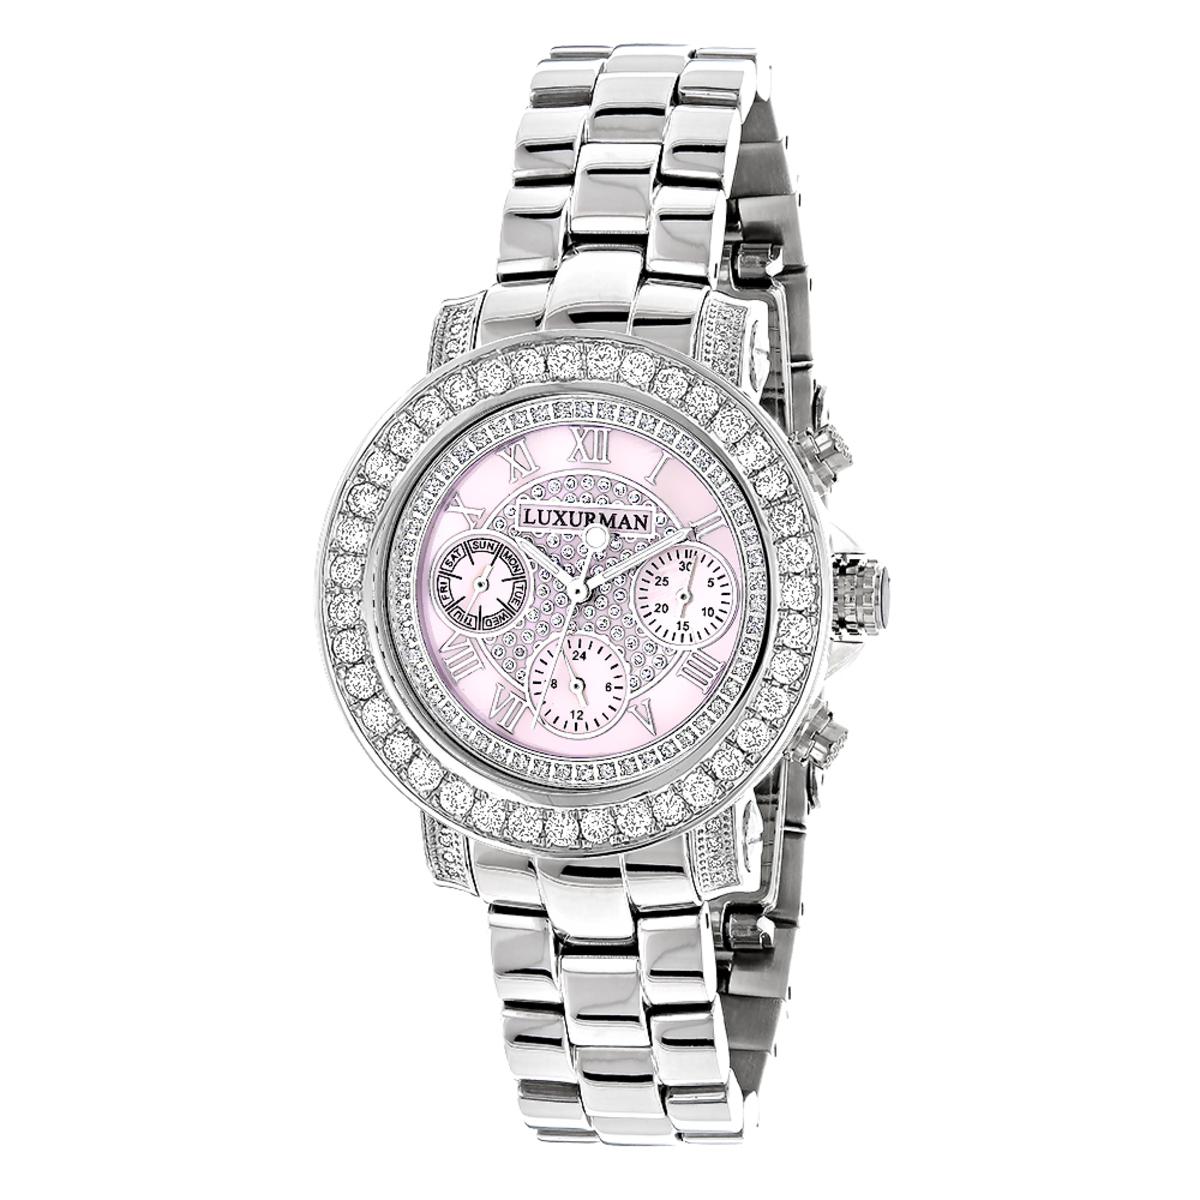 Luxurman Watches: Ladies Diamond Watch 3ct Pink